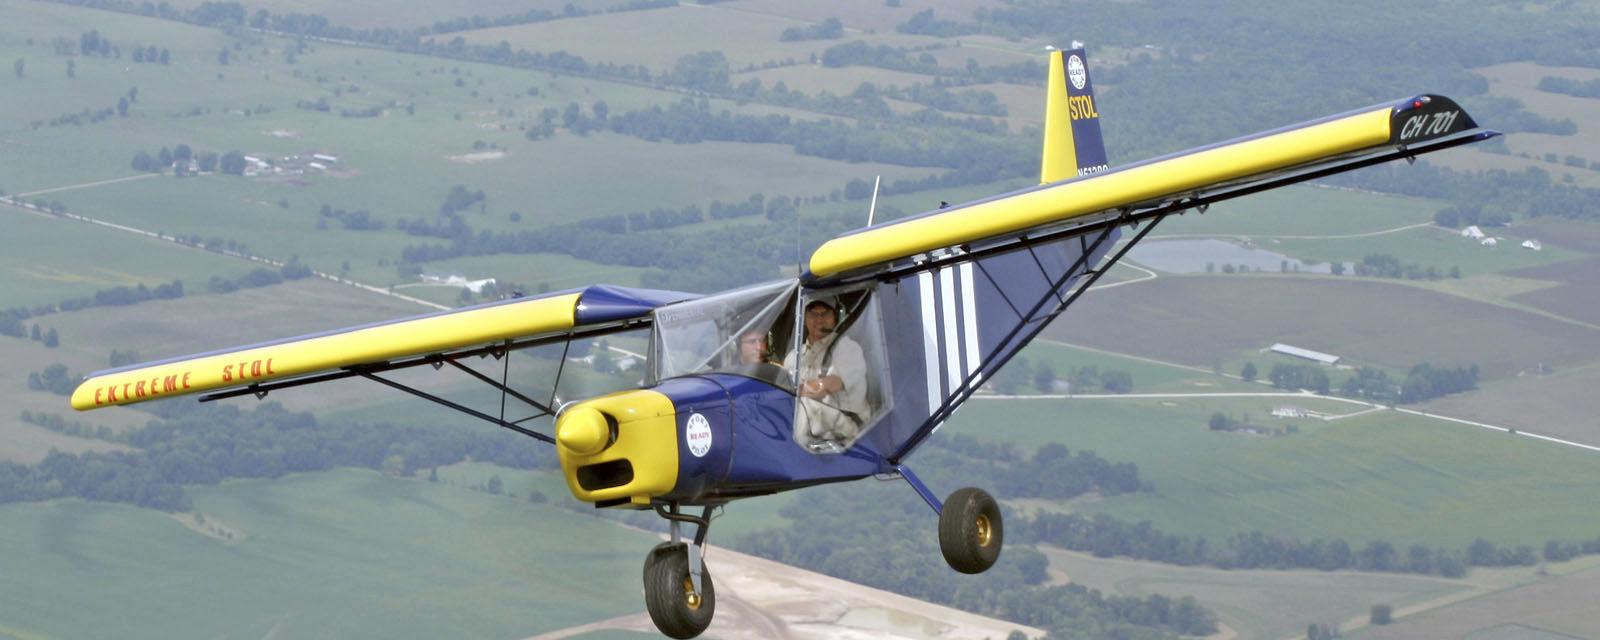 2-person LSA / 4-stroke engine / single-engine / kit - CH701